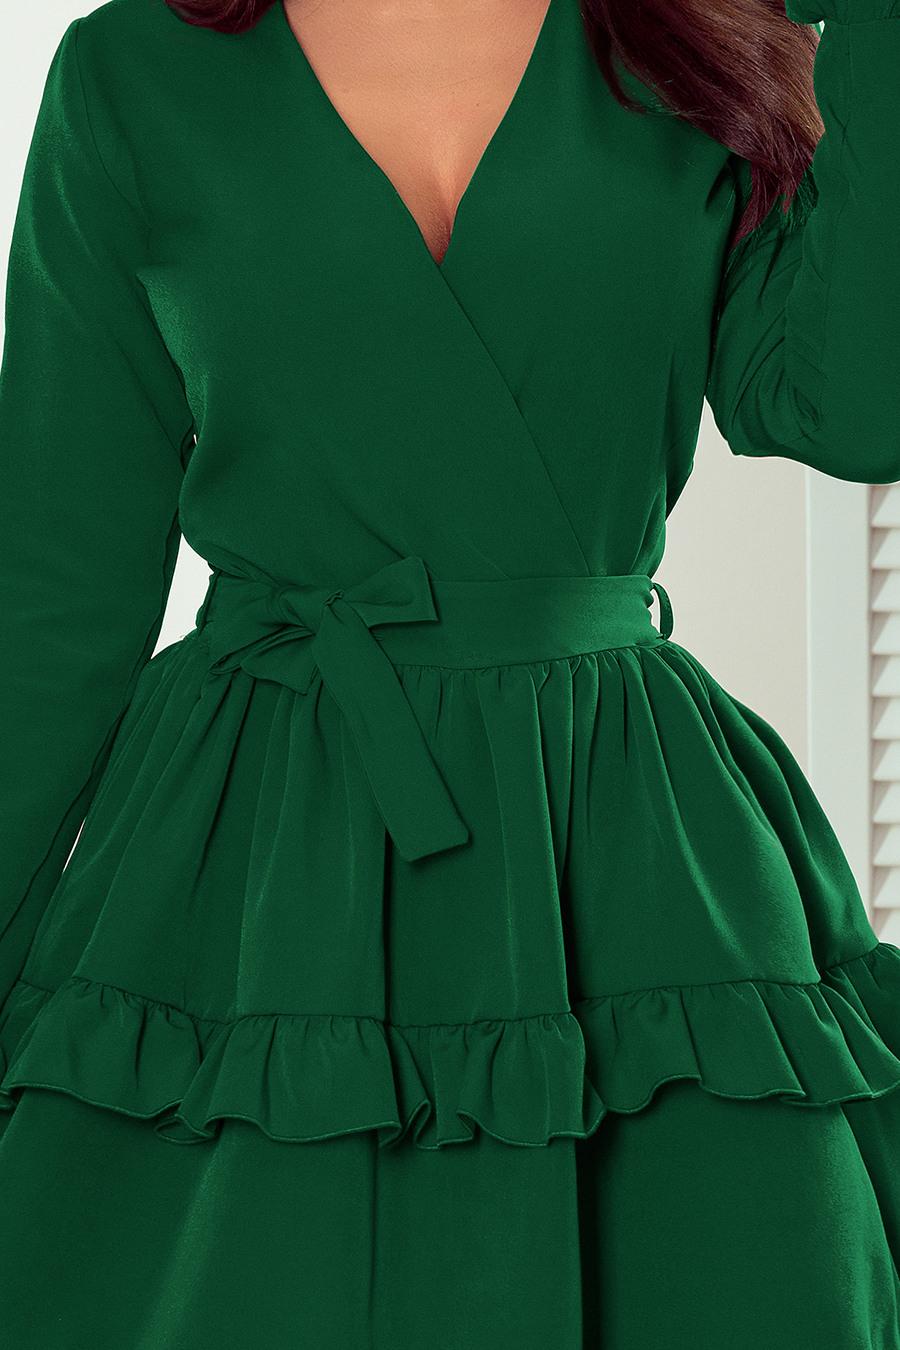 2721 Mia Kleid Mit Ausschnitt  Fuchsia  Numoco De